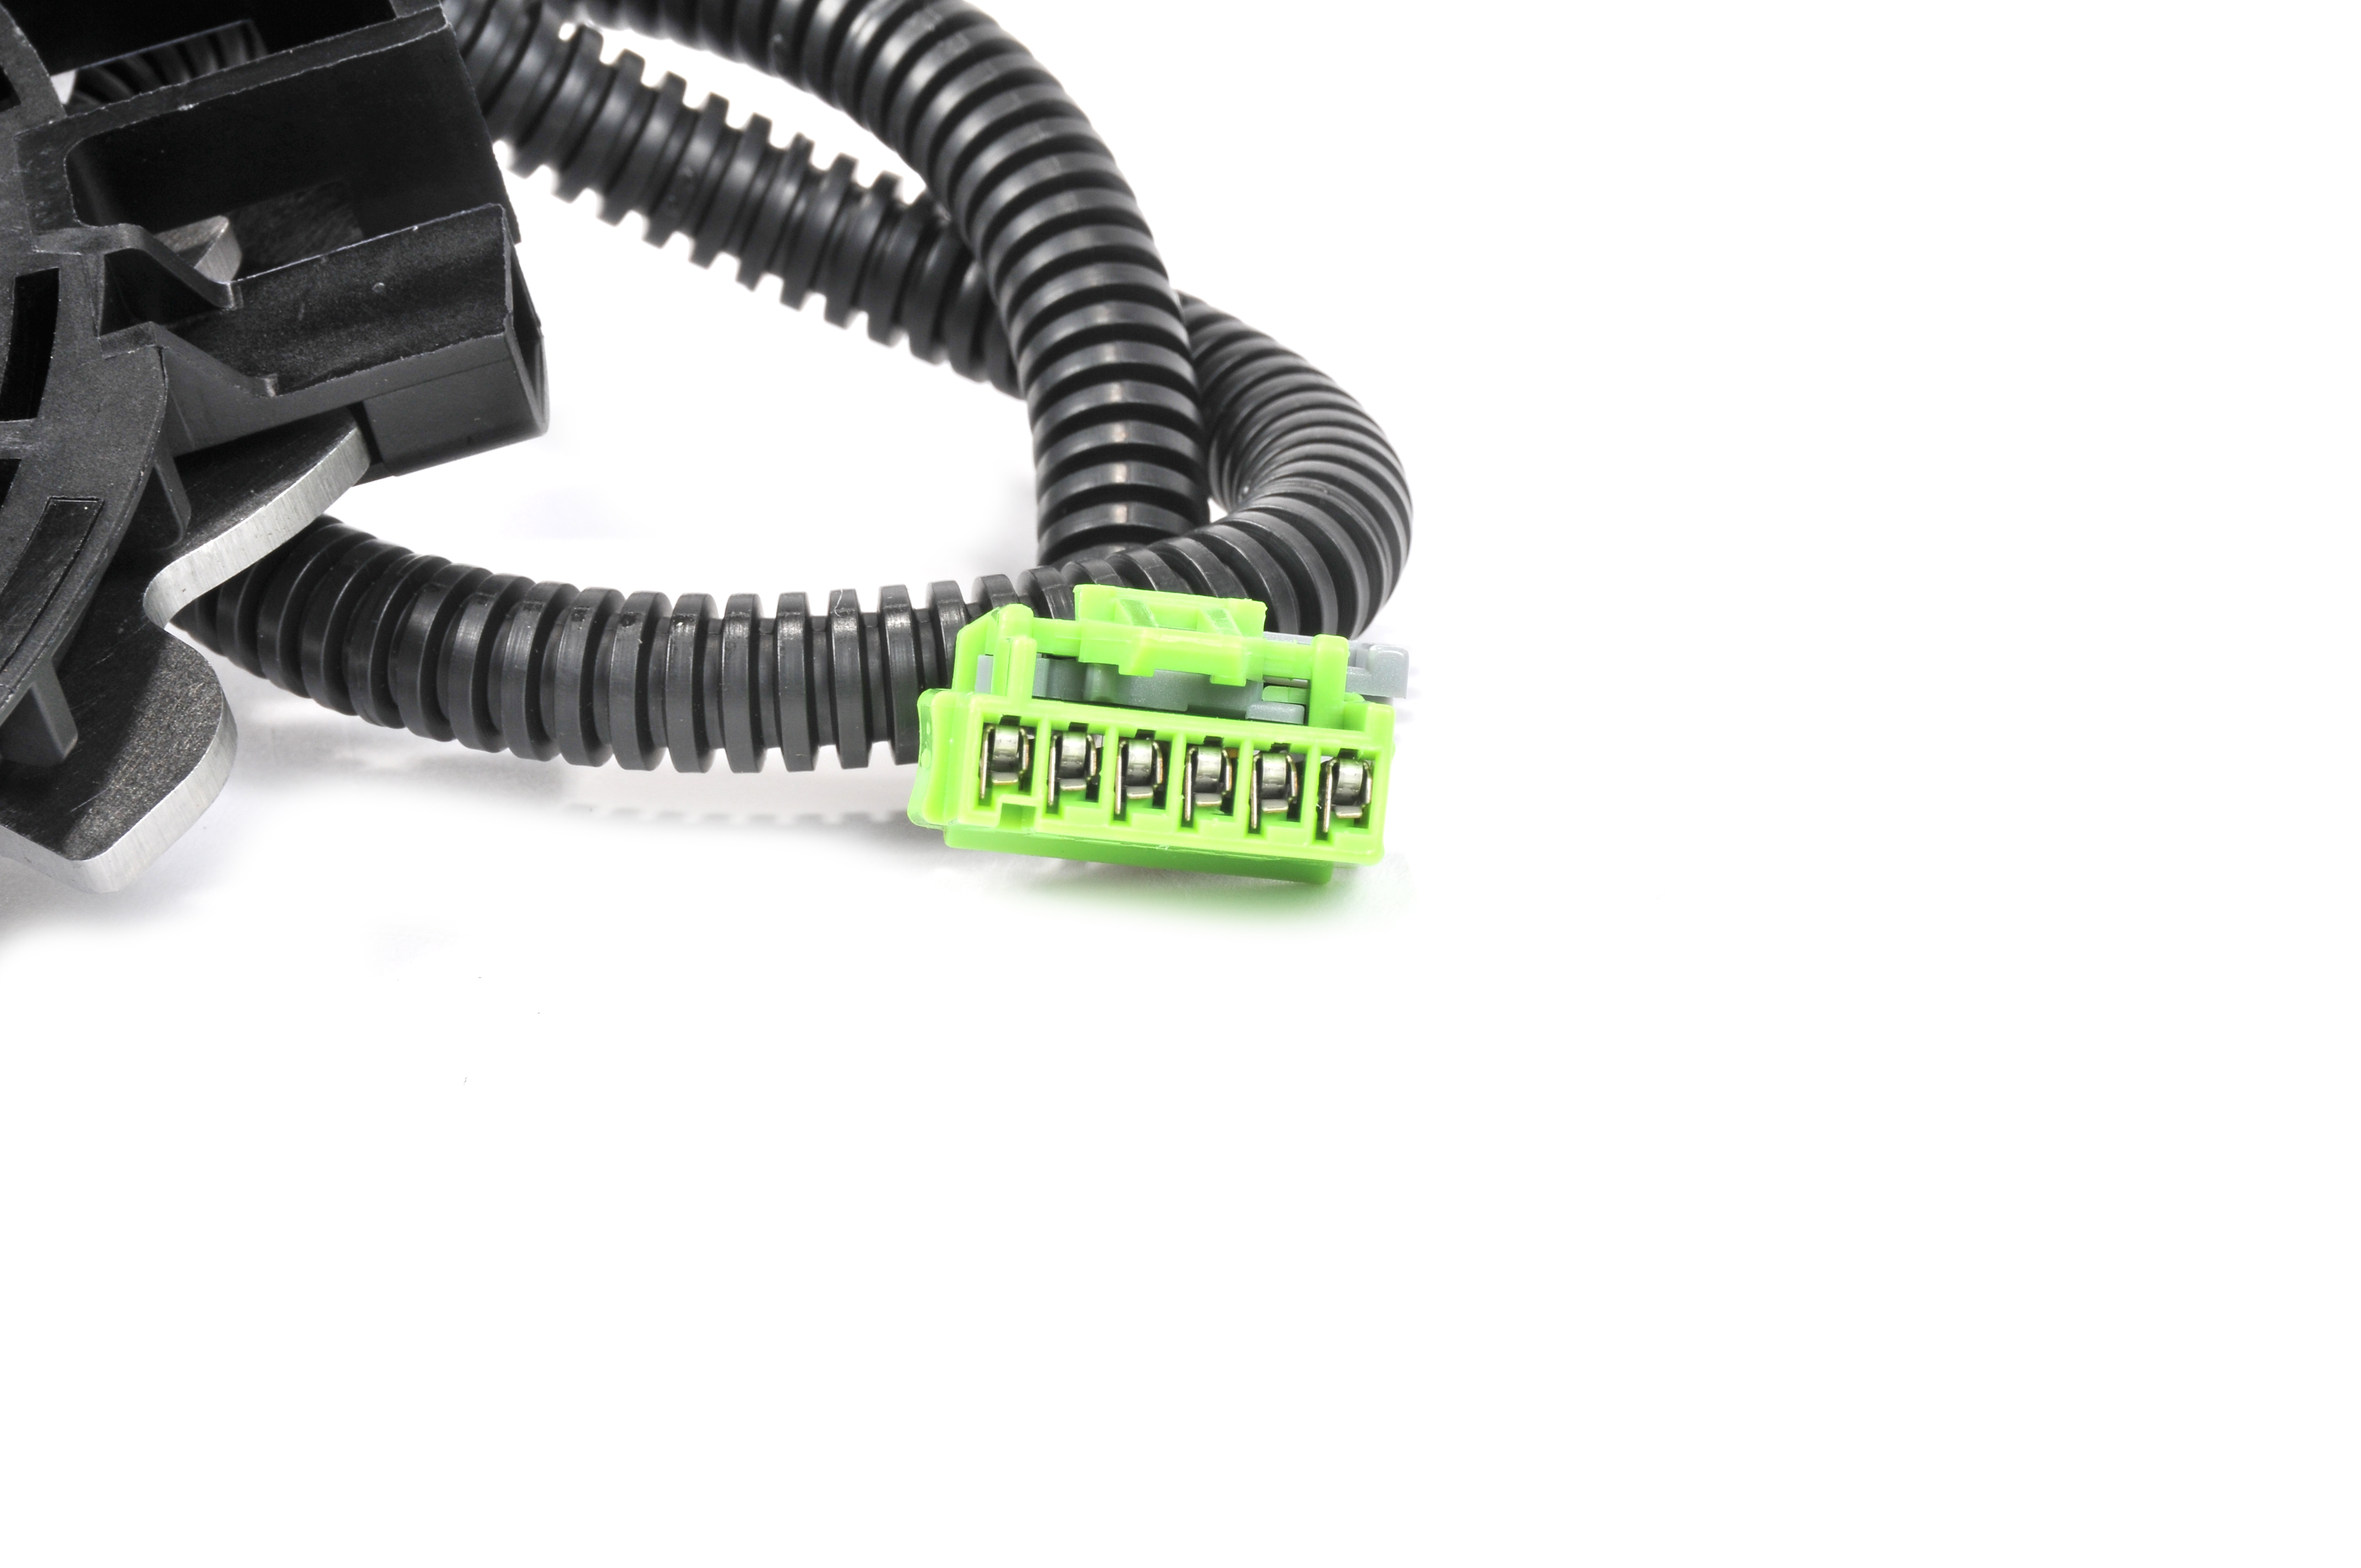 ACDELCO GM ORIGINAL EQUIPMENT - Automatic Transmission Manual Shaft Detent Lever - DCB 24276217